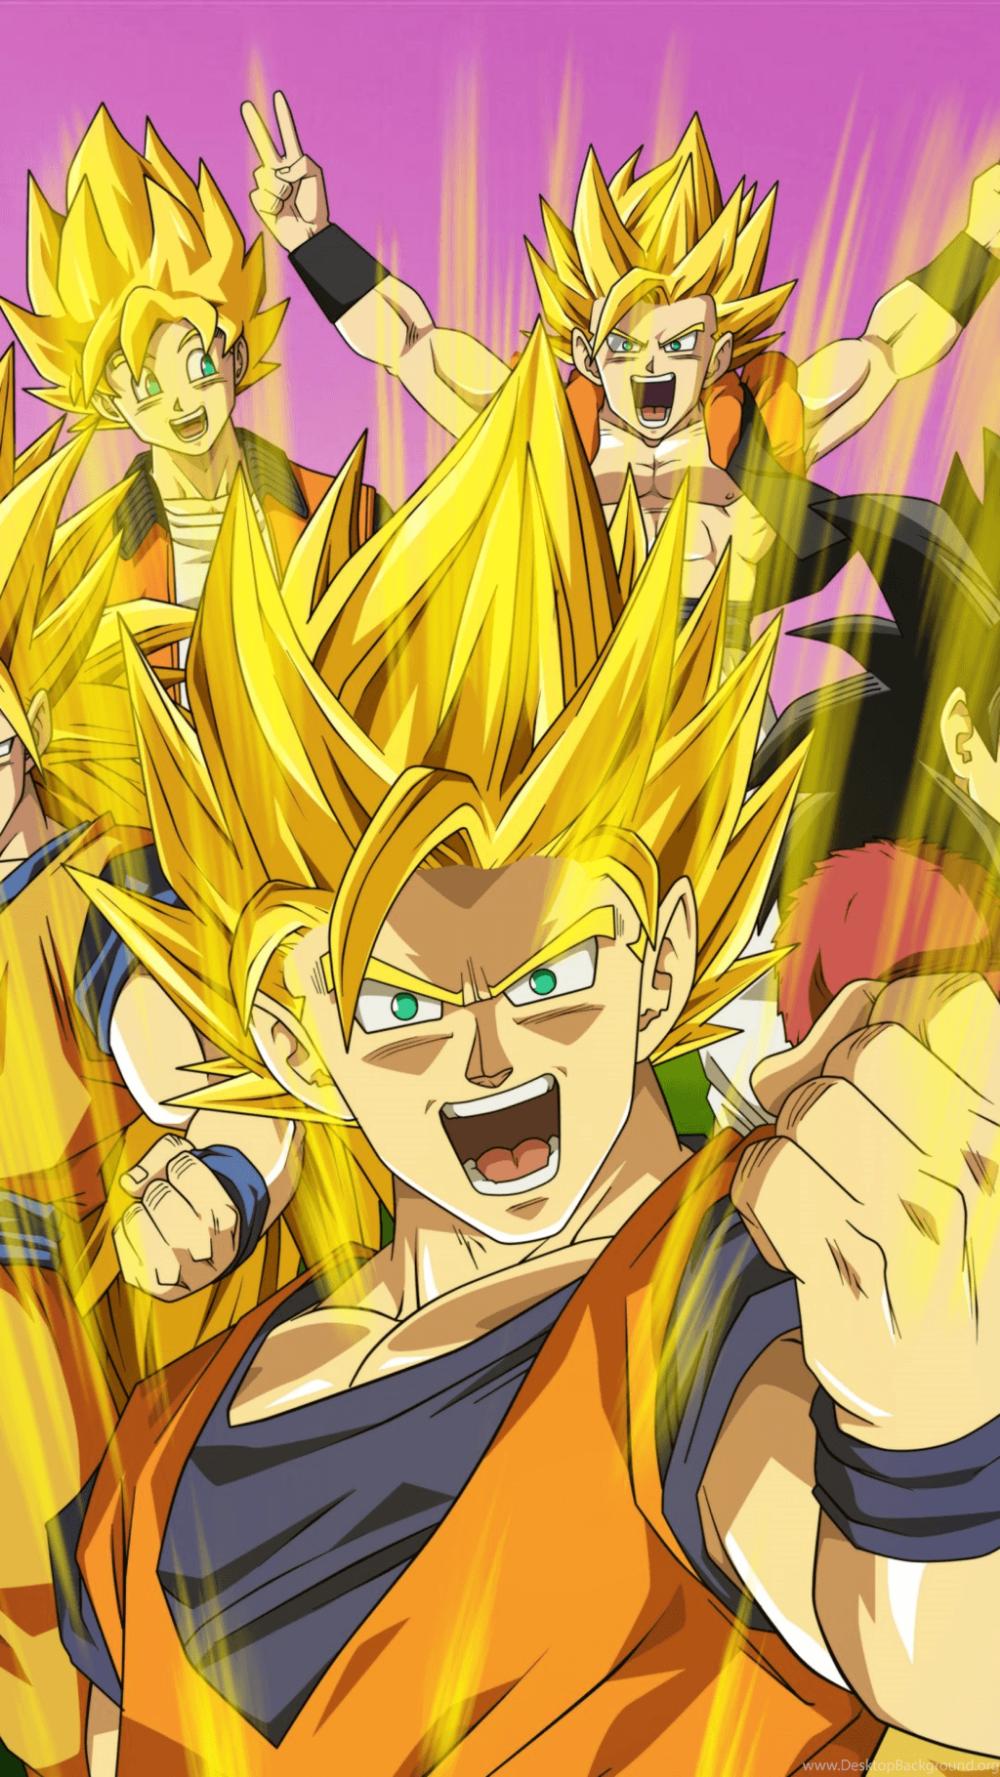 Anime Wallpaper Whatsapp Anime in 2020 Dragon ball z